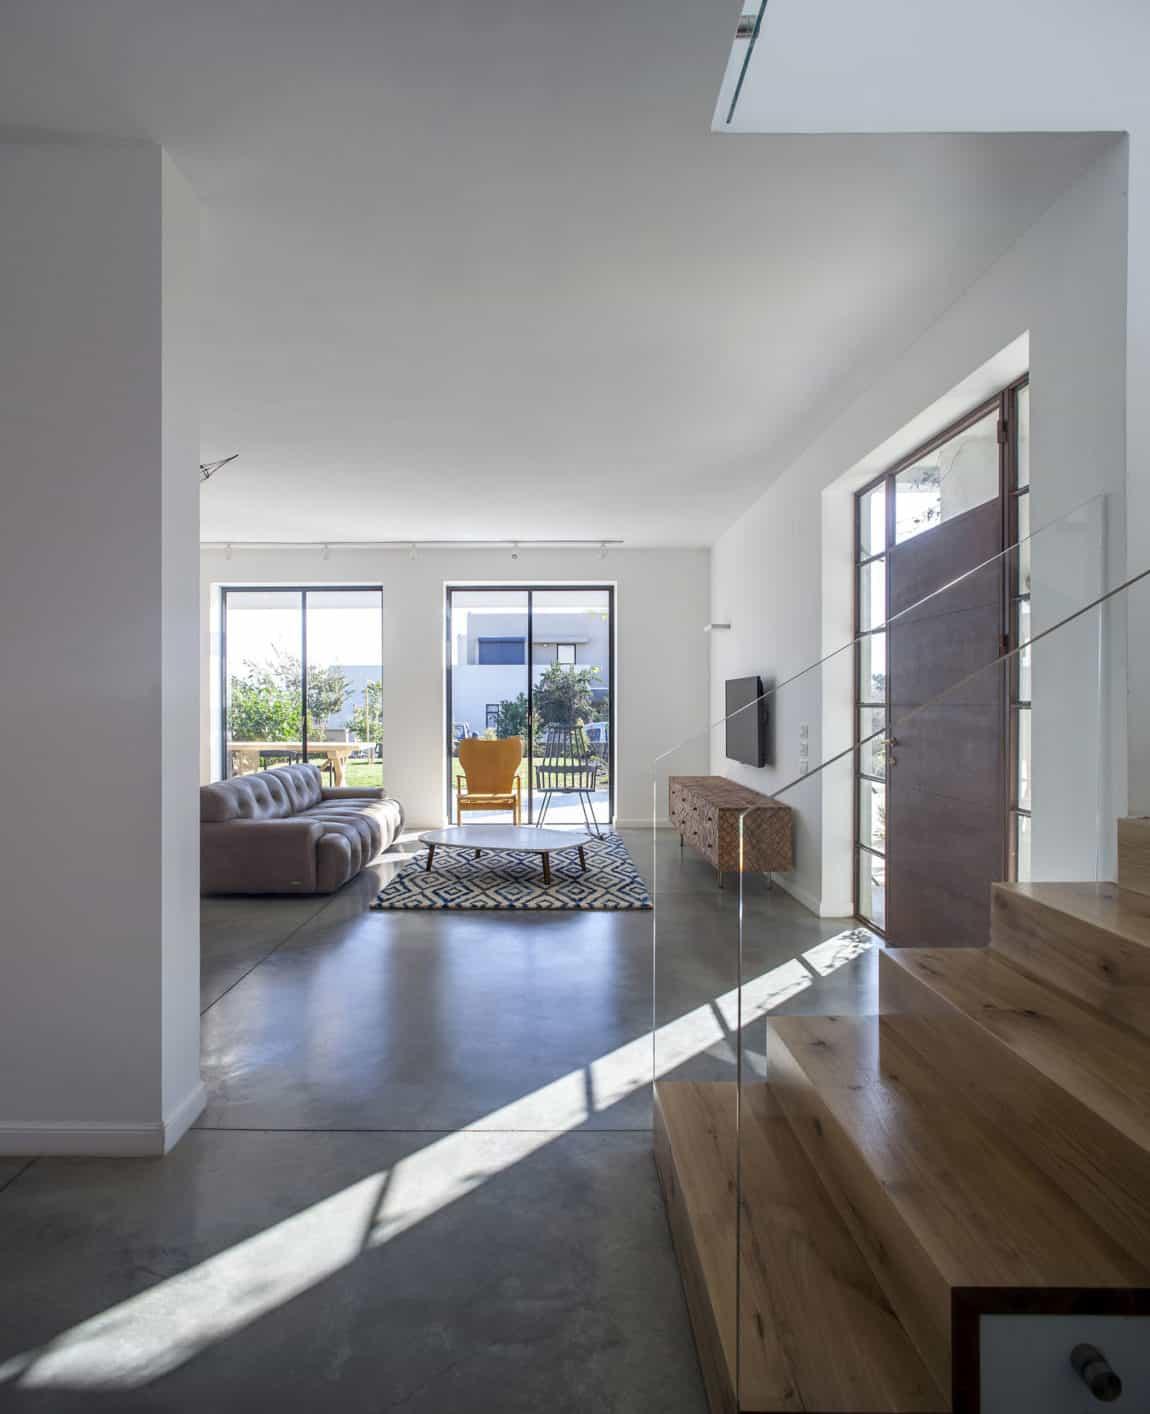 Kibbutz Family House by Henkin Shavit Architecture (15)